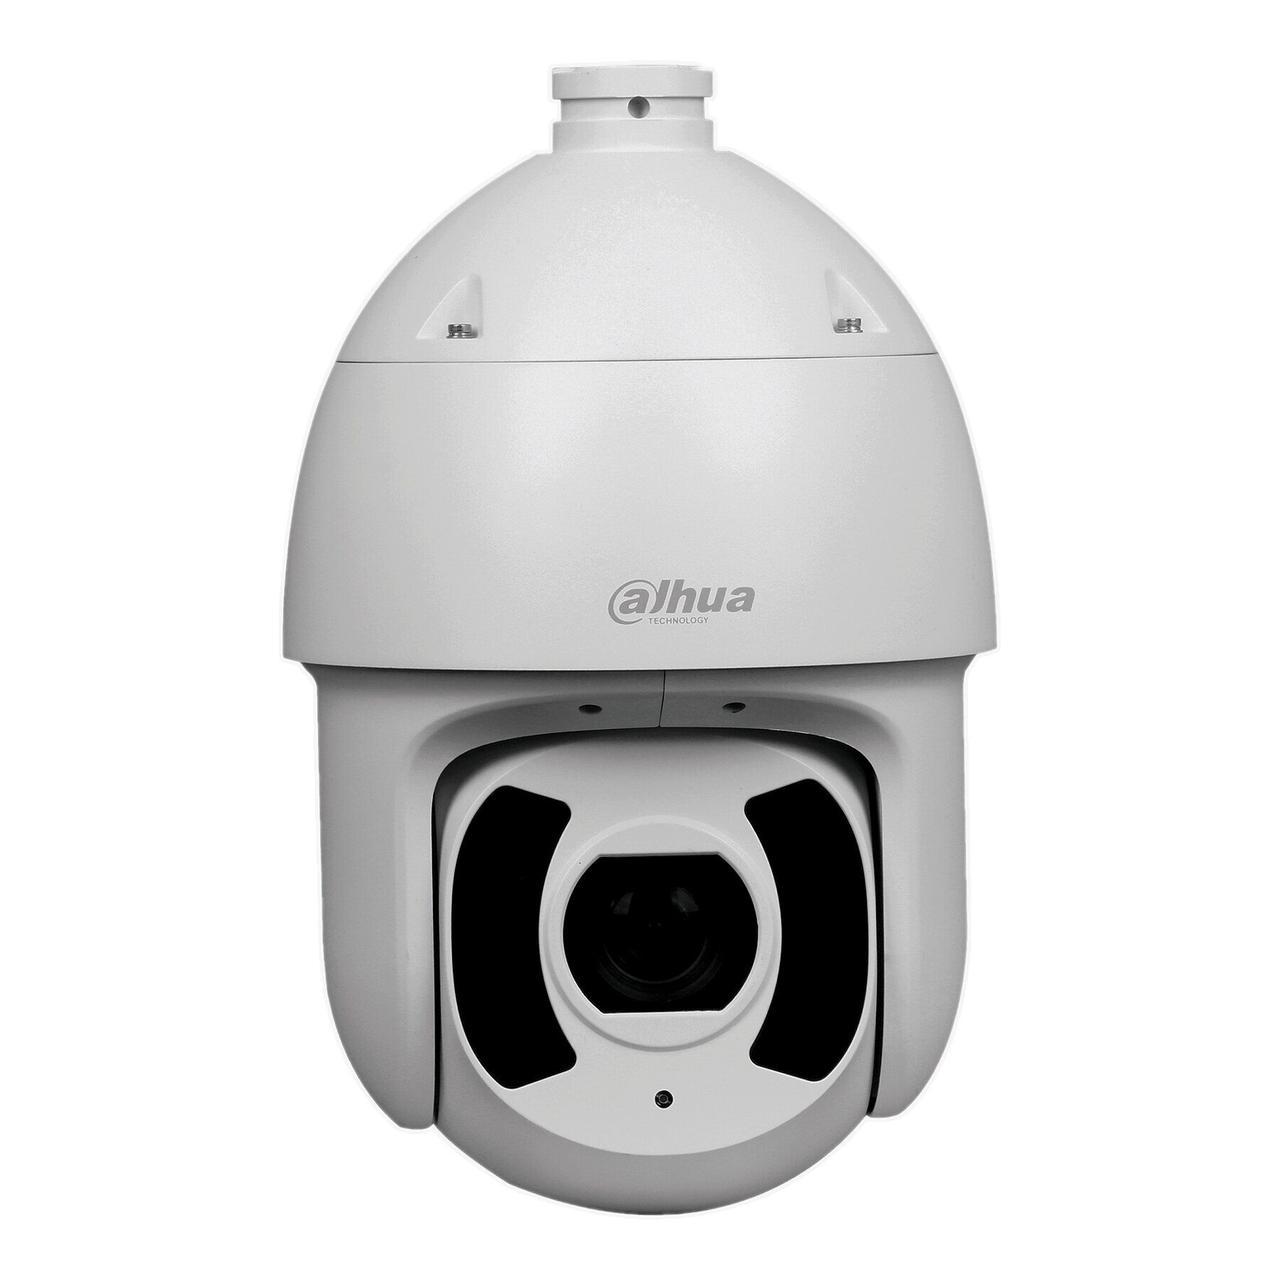 2Мп 45x сетевая видеокамера Starlight PTZ Dahua DH-SD6CE245U-HNI